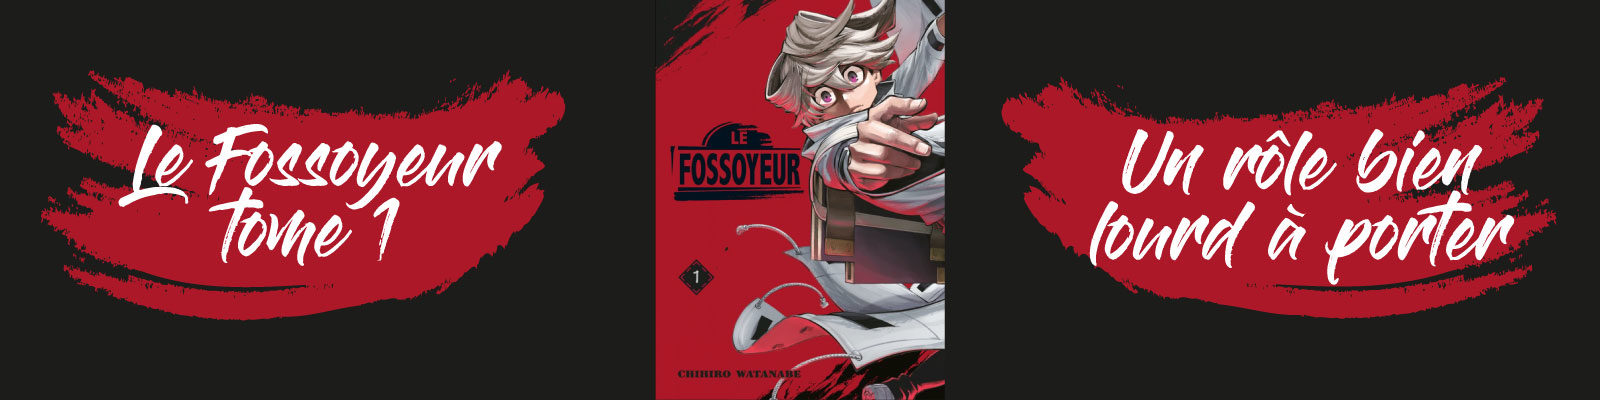 Le Fossoyeur-Vol.-1